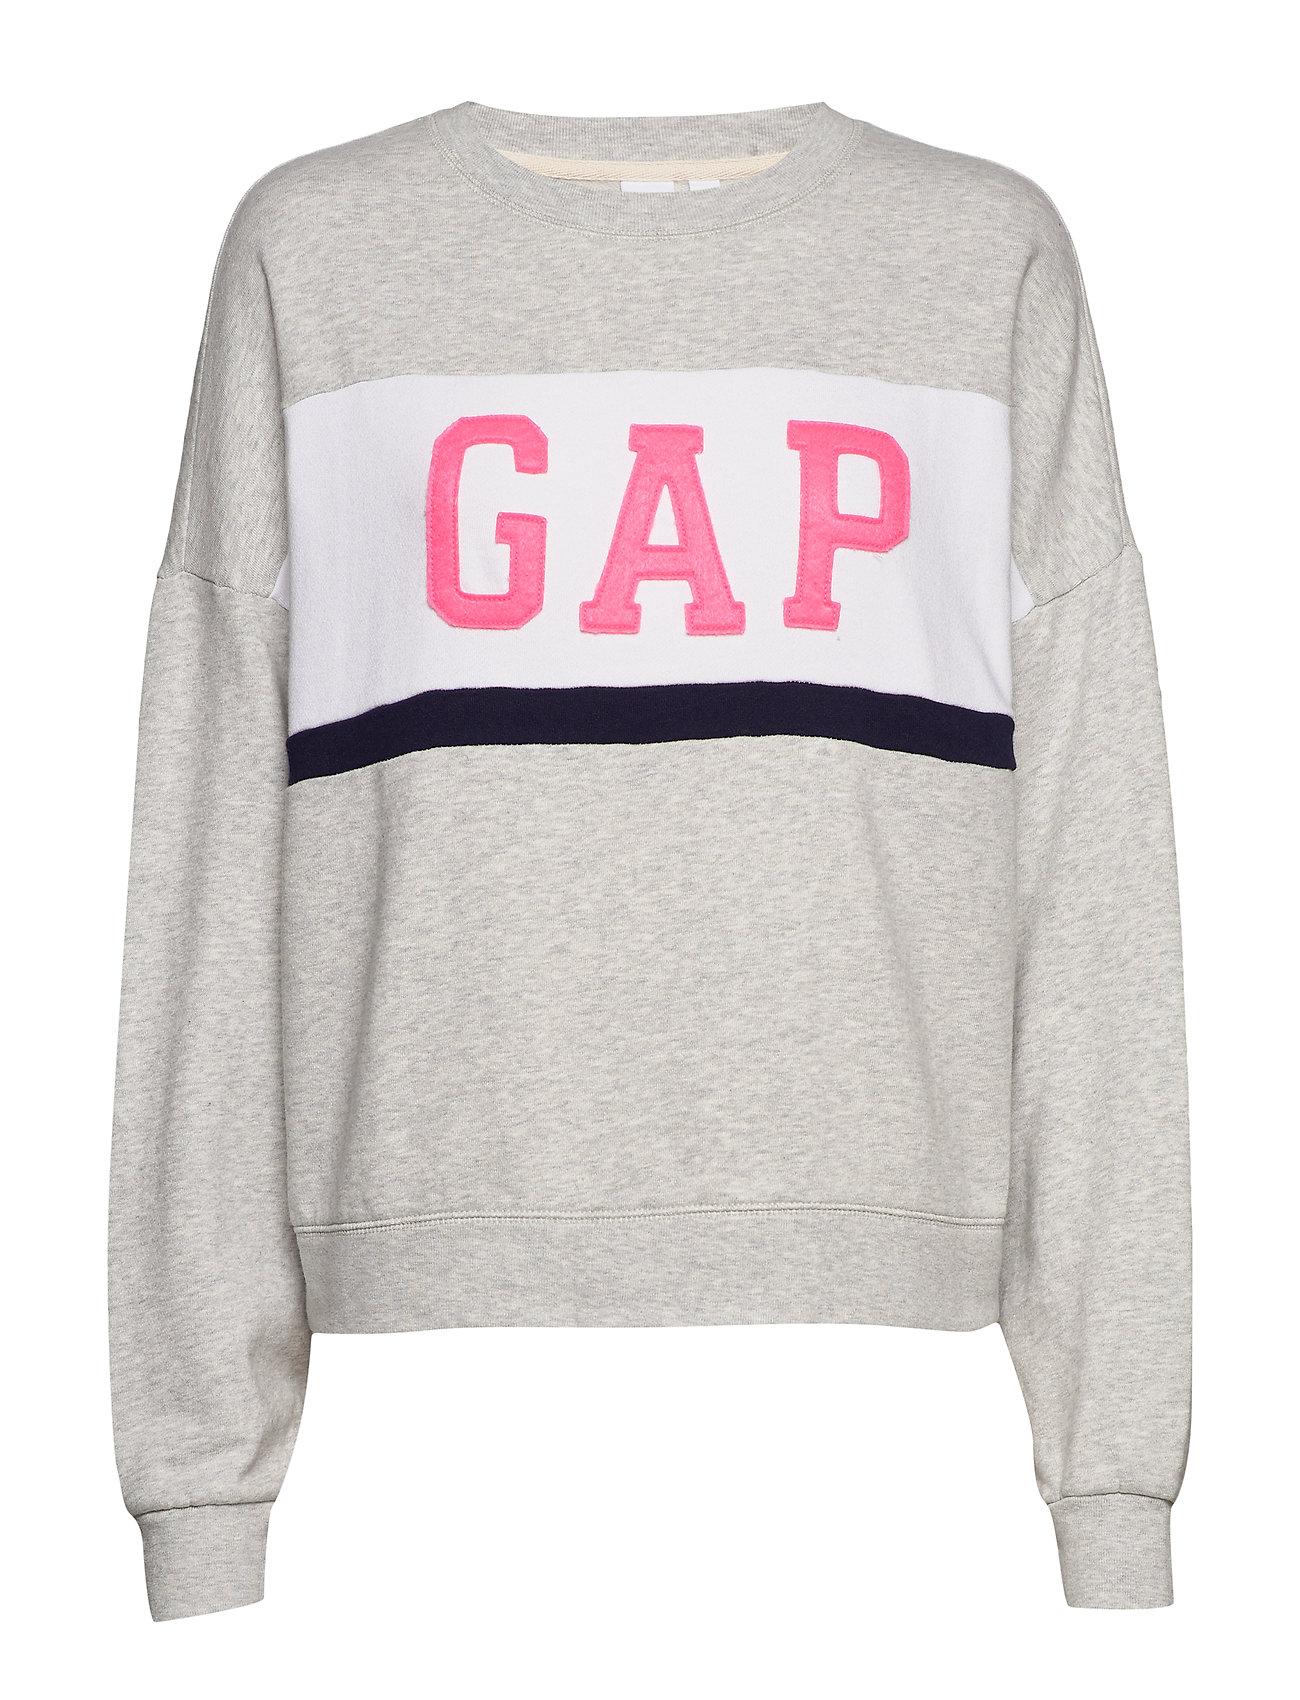 GAP Gap Logo Colorblock Crewneck Sweatshirt - LIGHT HEATHER GREY